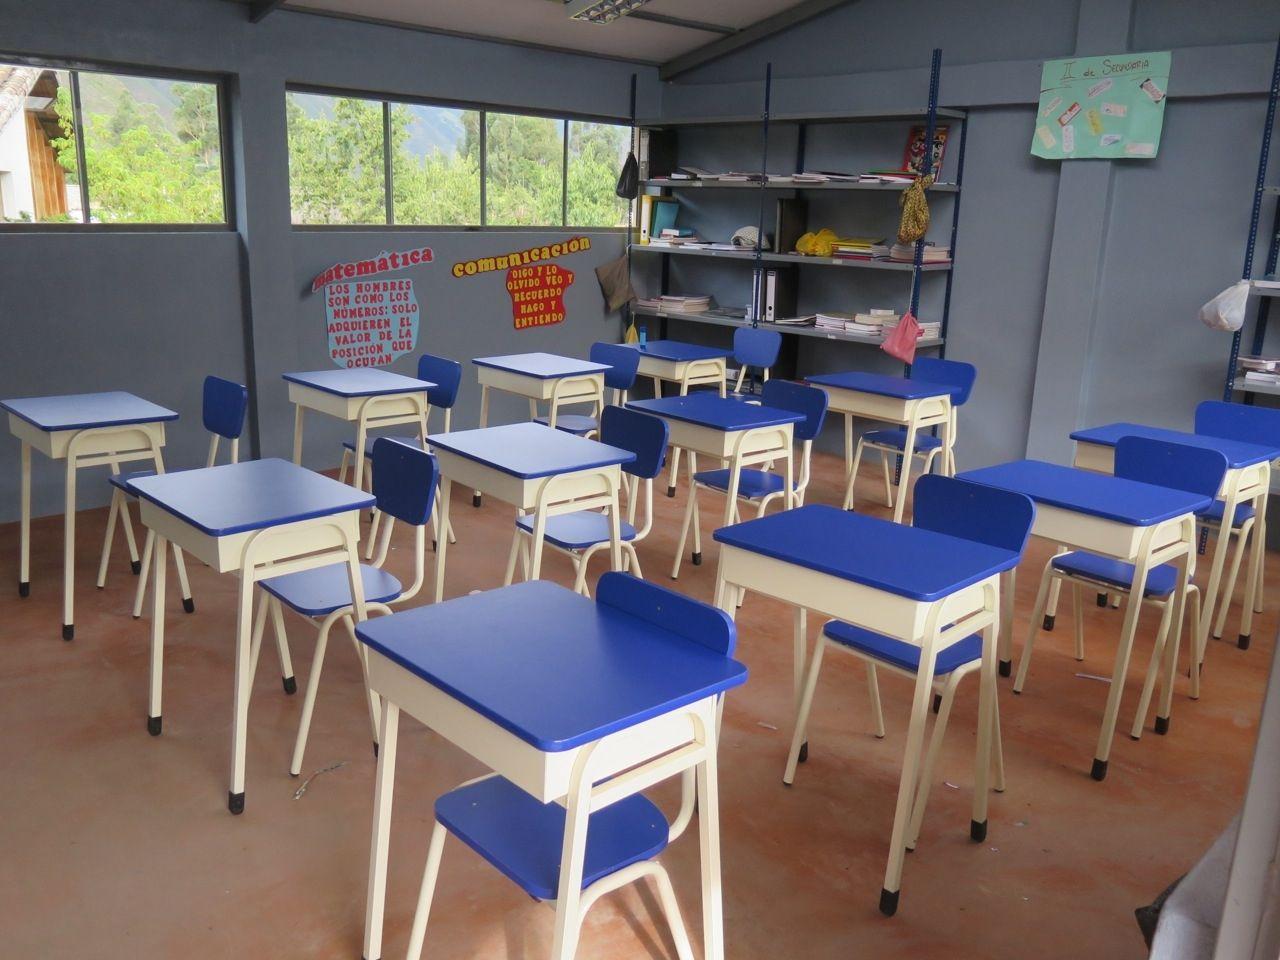 Primary School Desks And Chairs School desks, Primary